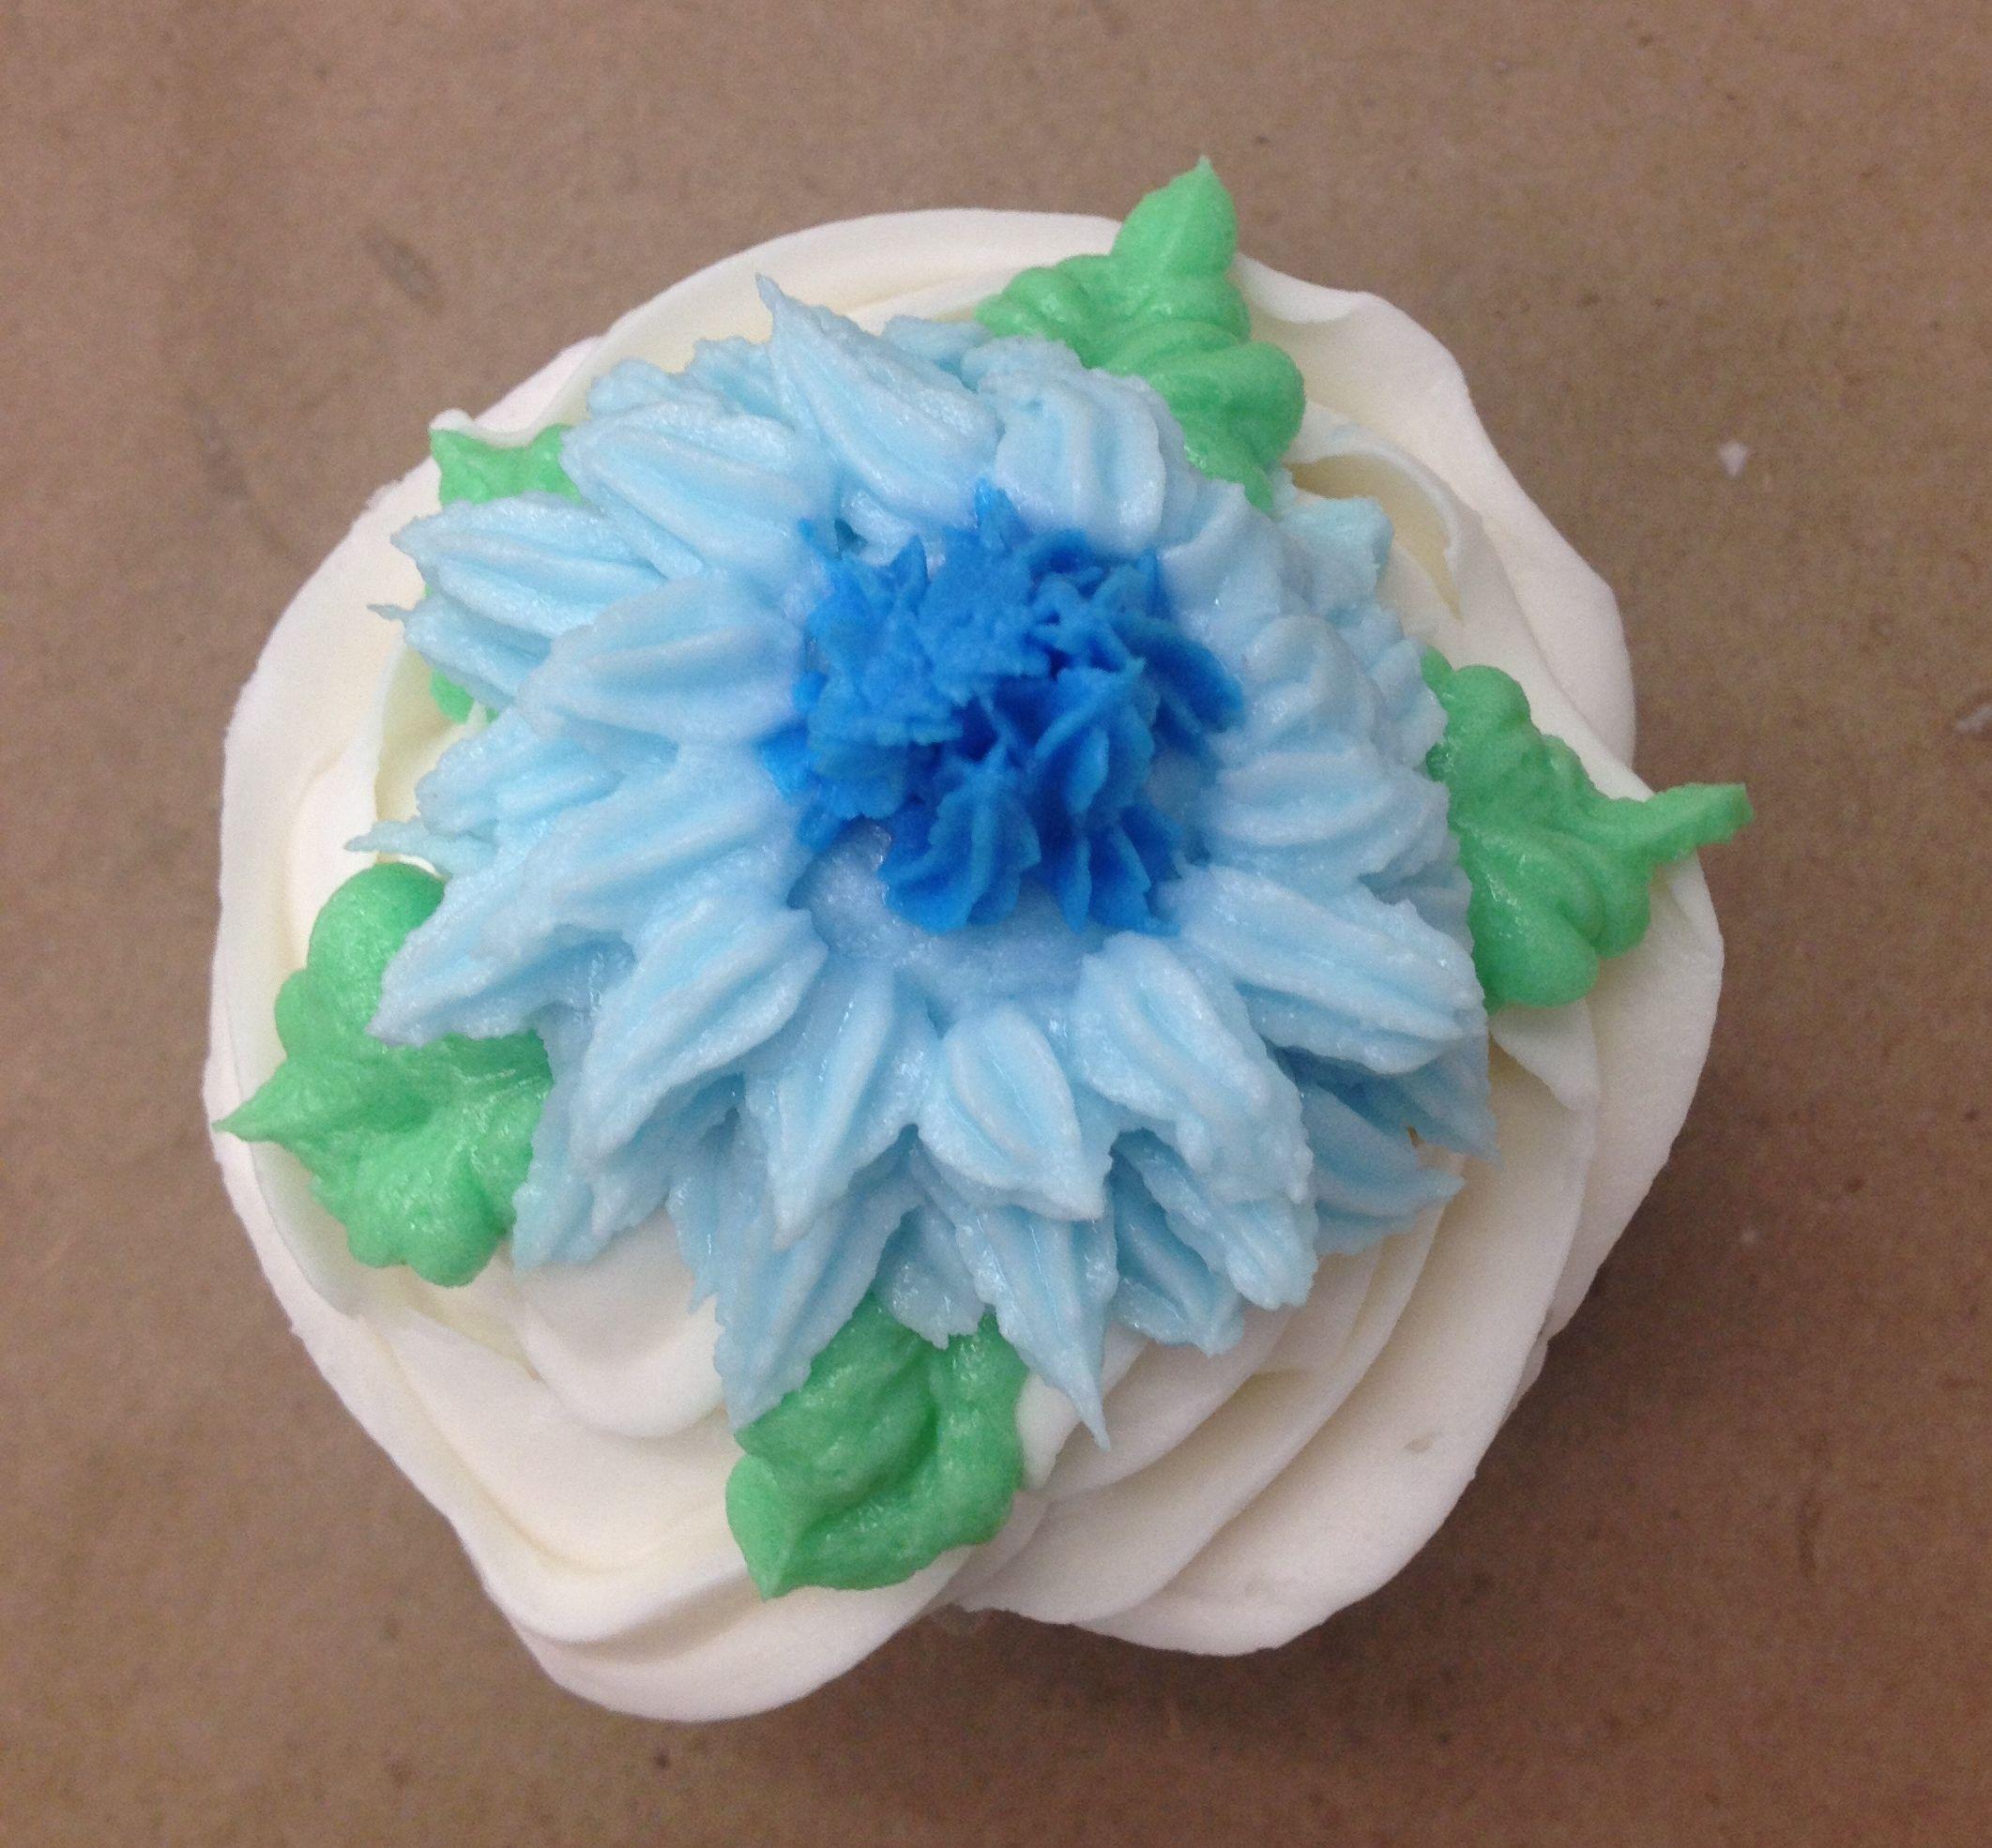 Wiltoncontest Wilton Cake Decorating Course 1 Class 3